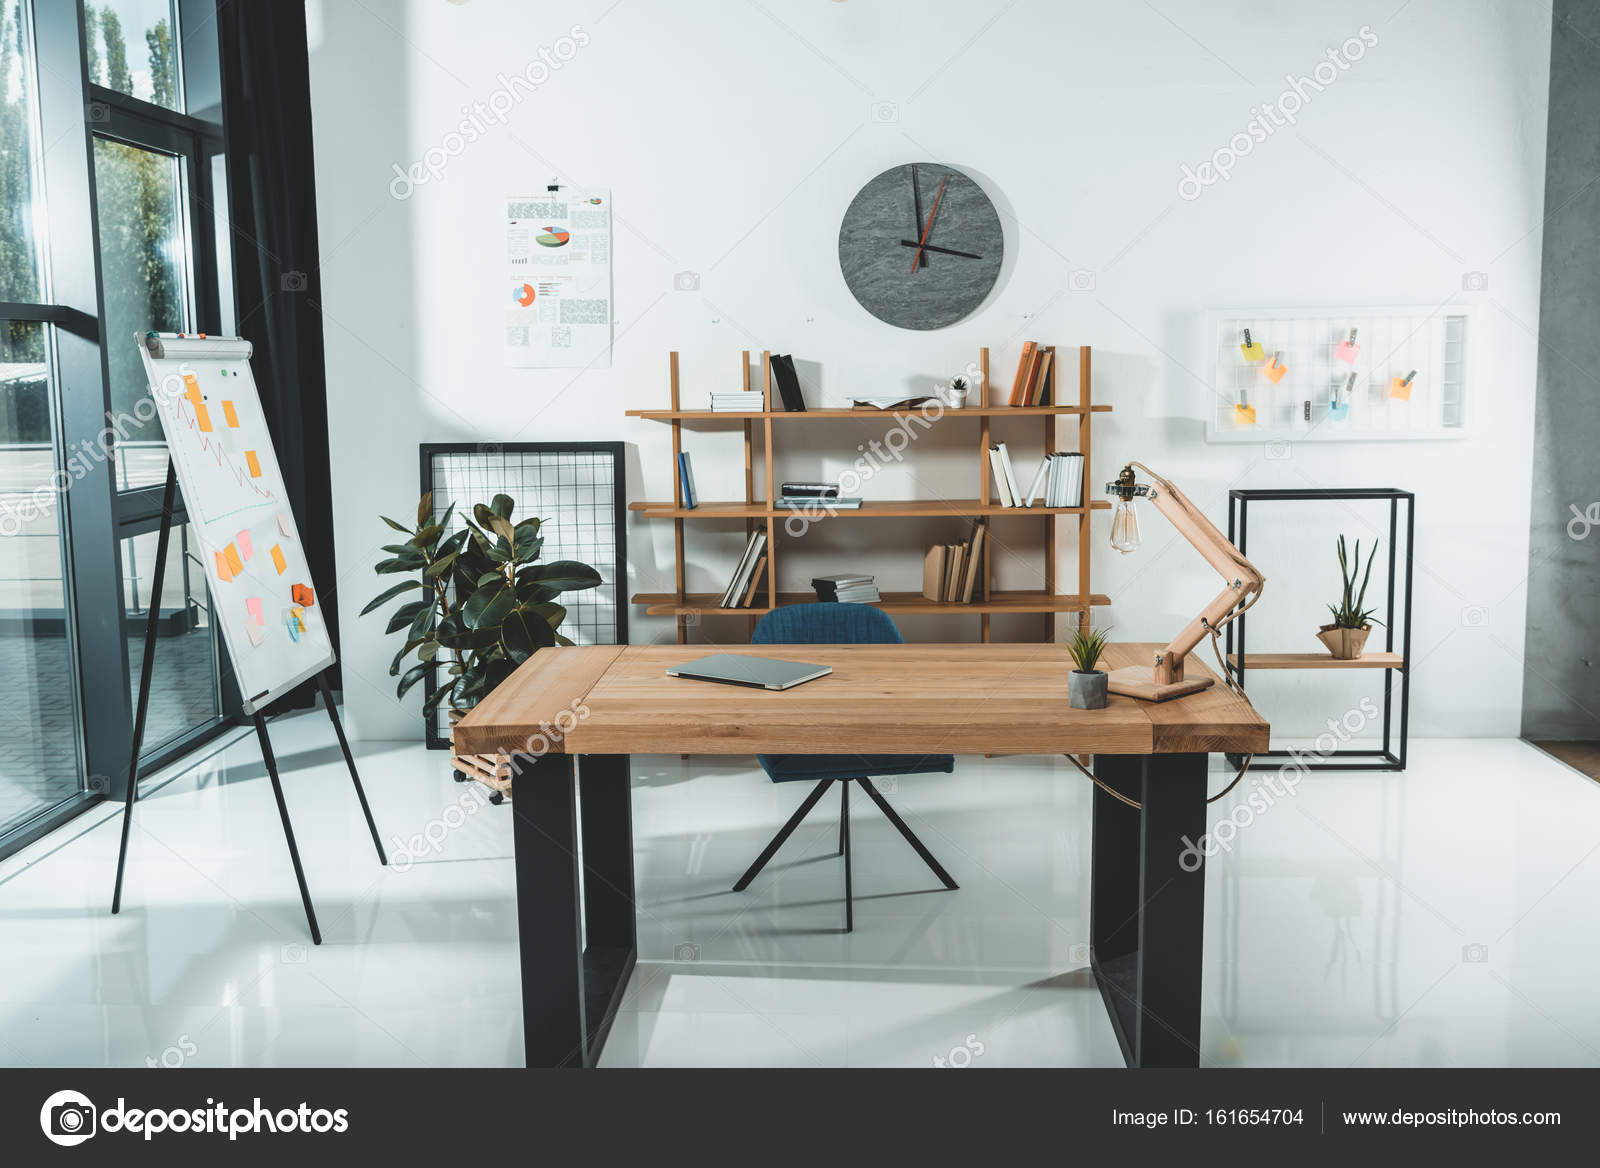 Lieu de travail vide au bureau u2014 photographie alexnazaruk © #161654704